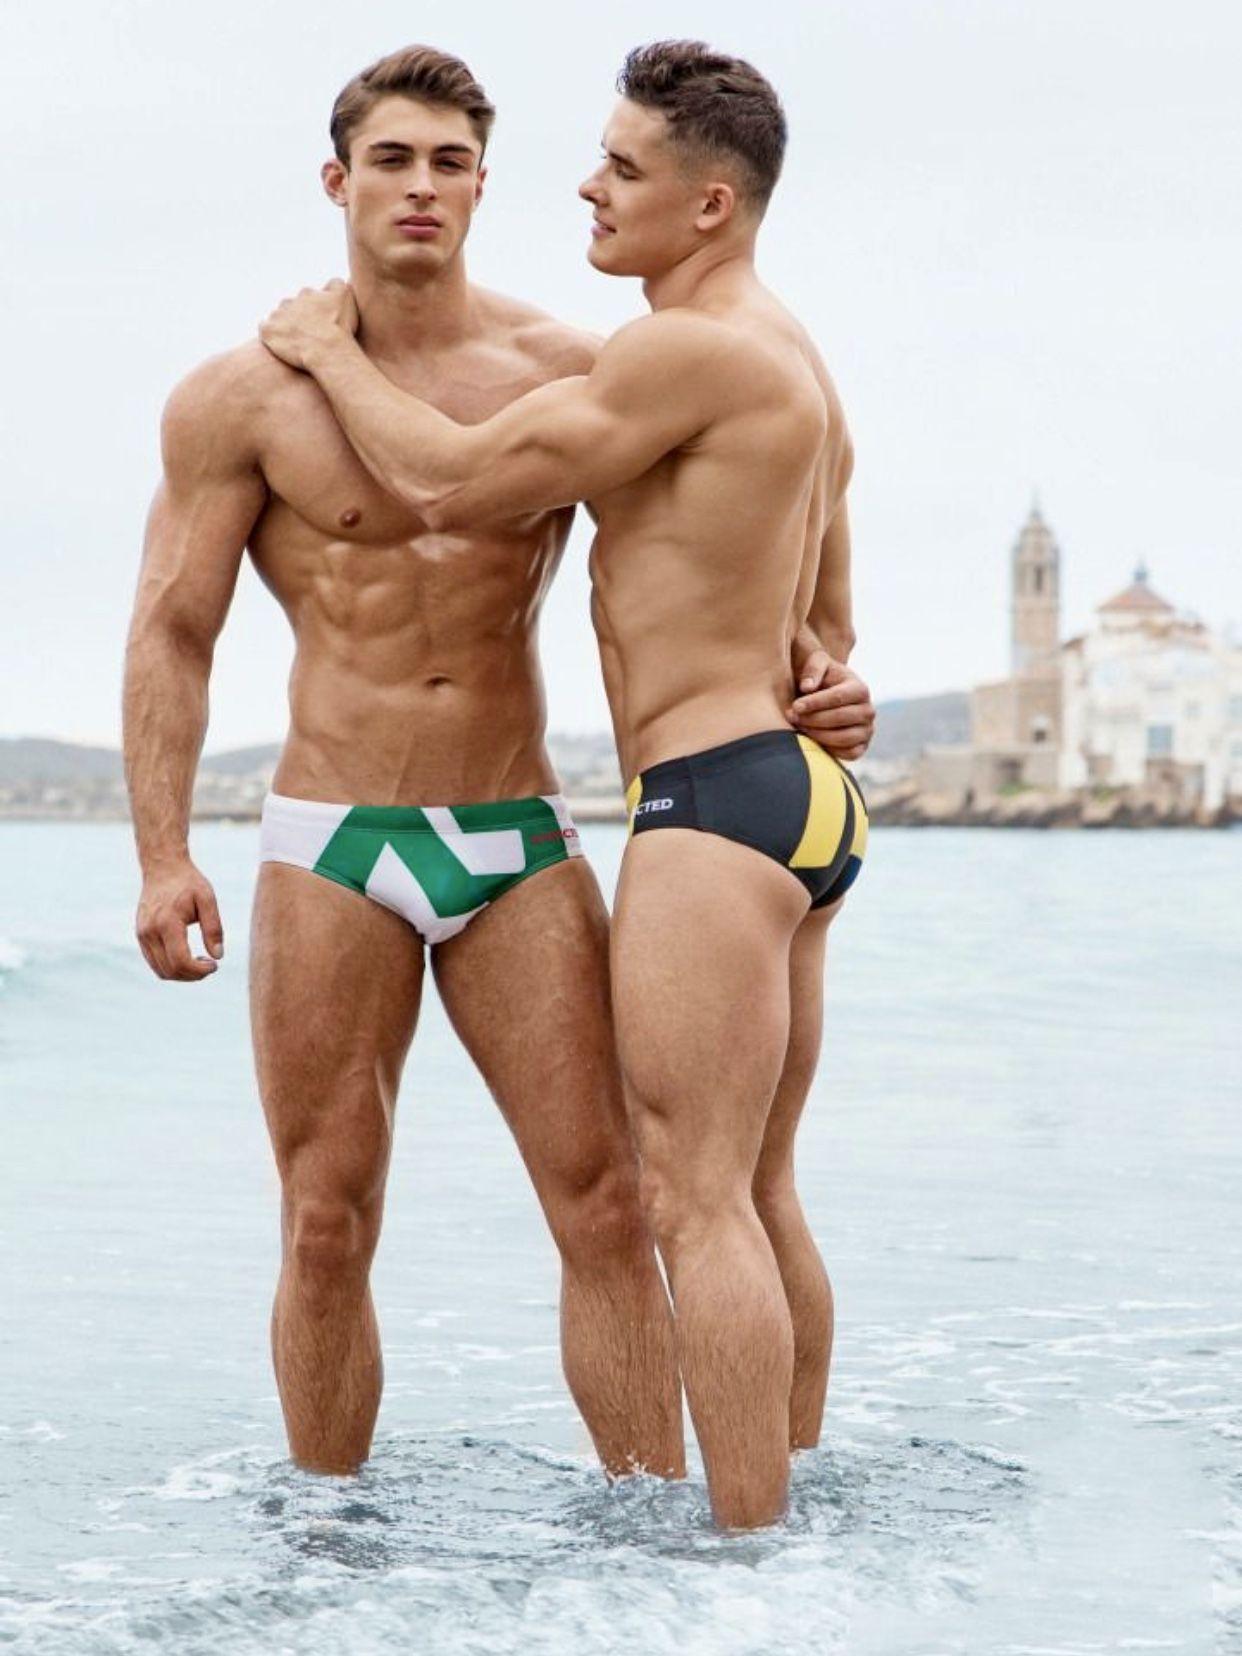 Men gay com hot www Gay Hot